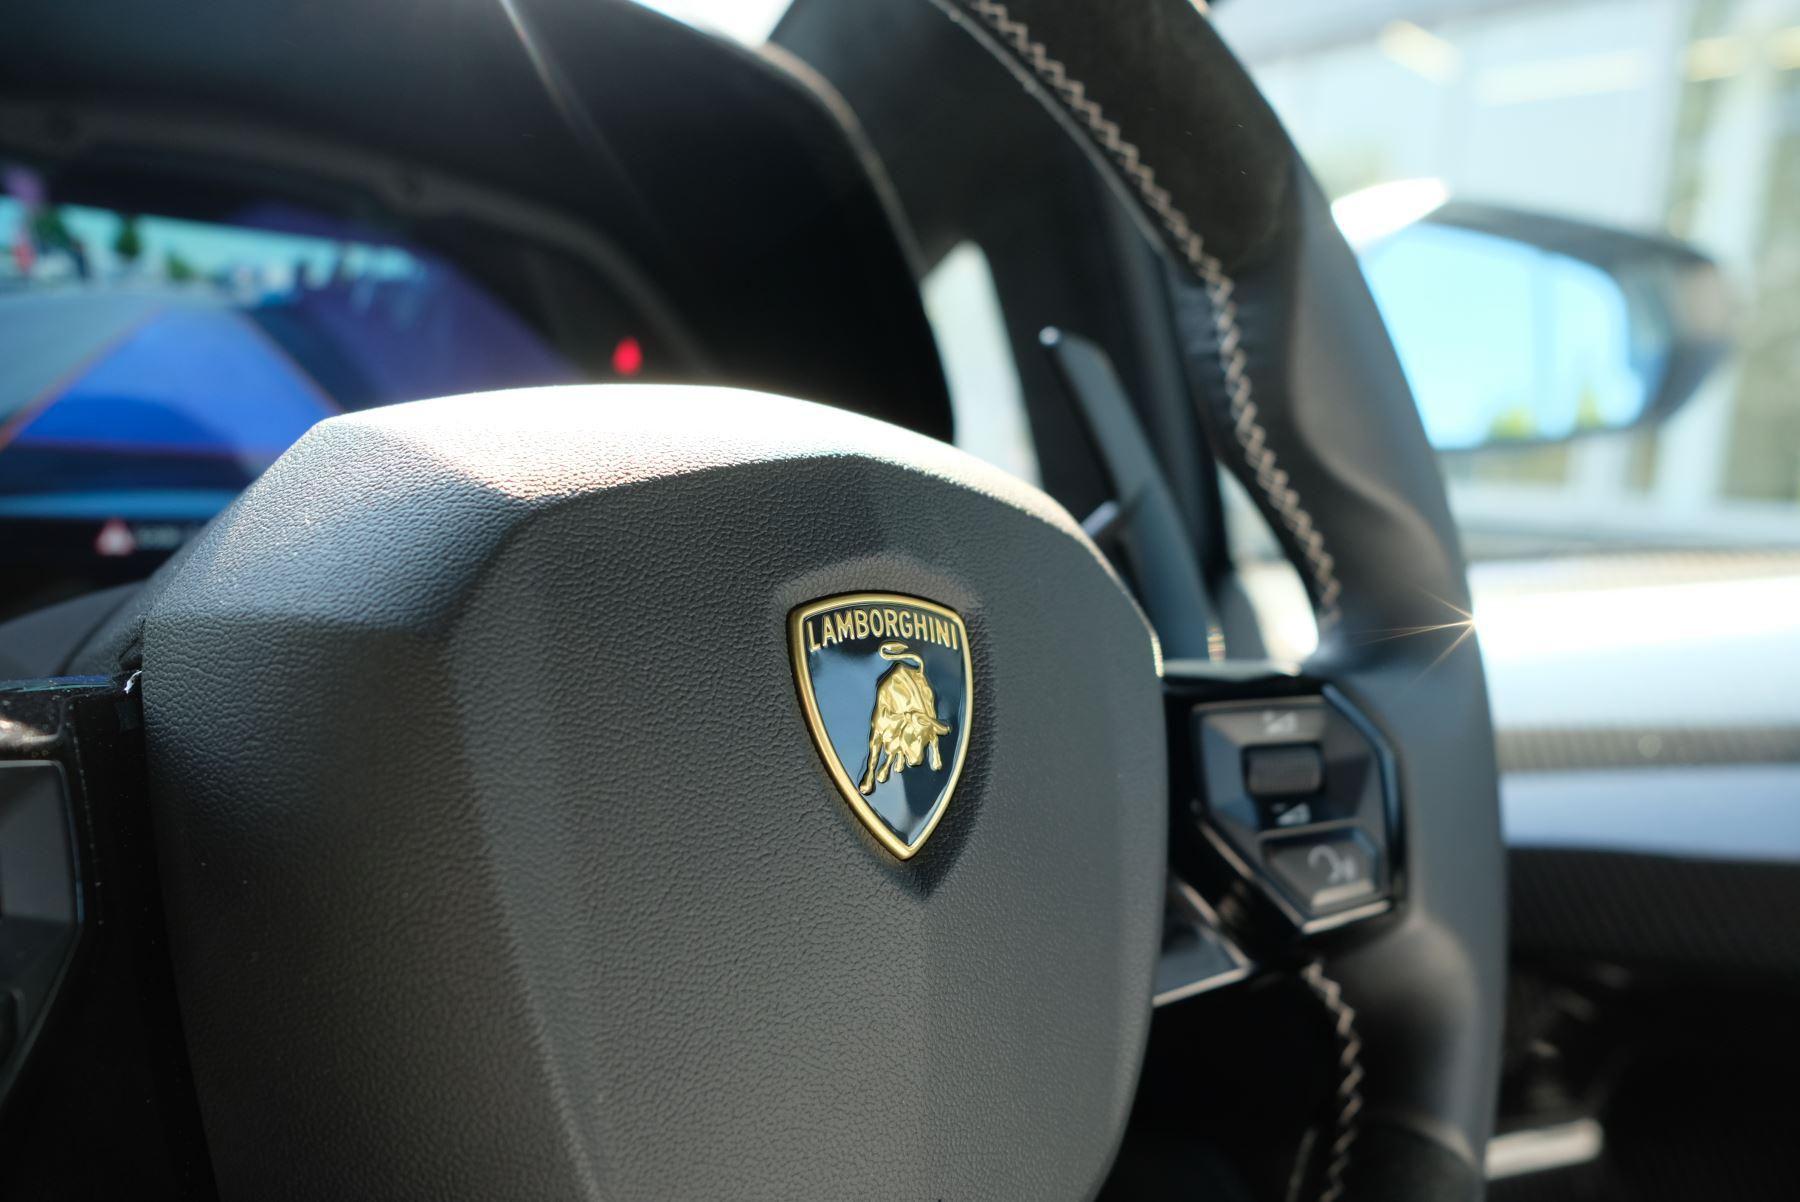 Lamborghini Aventador SVJ Coupe VAT Qualifying image 23